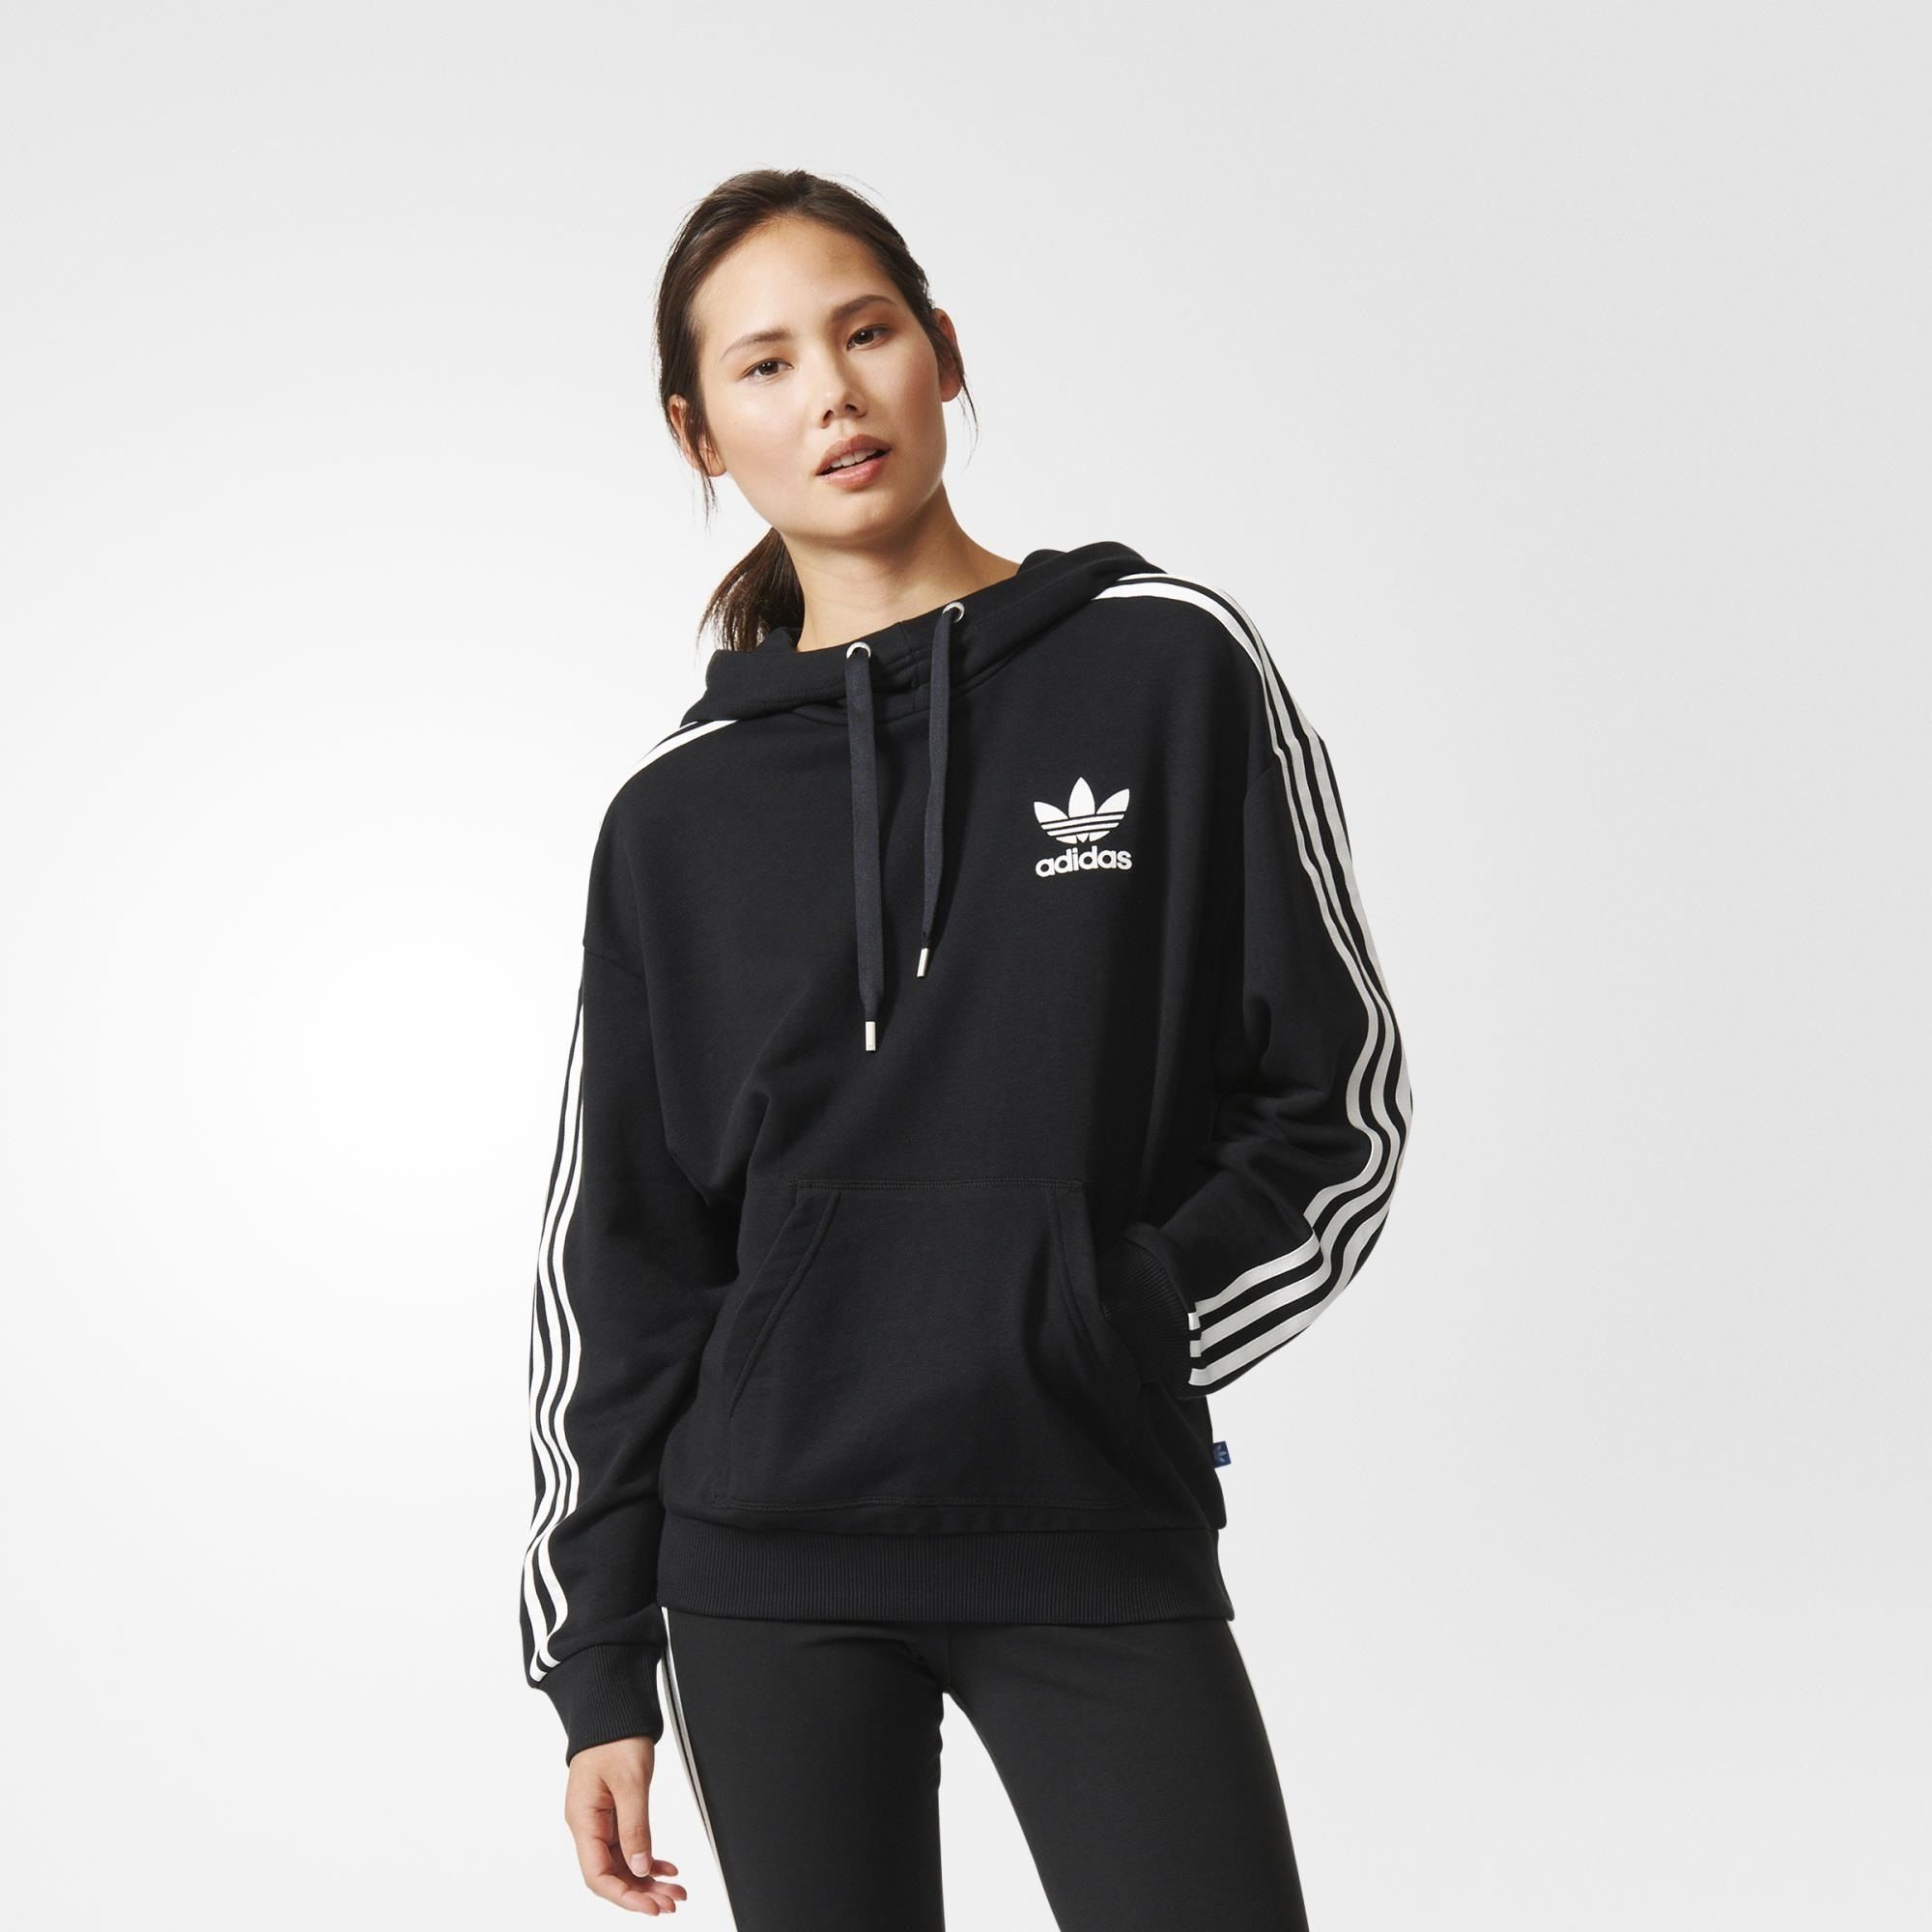 adidas stripes hoodie black adidas us